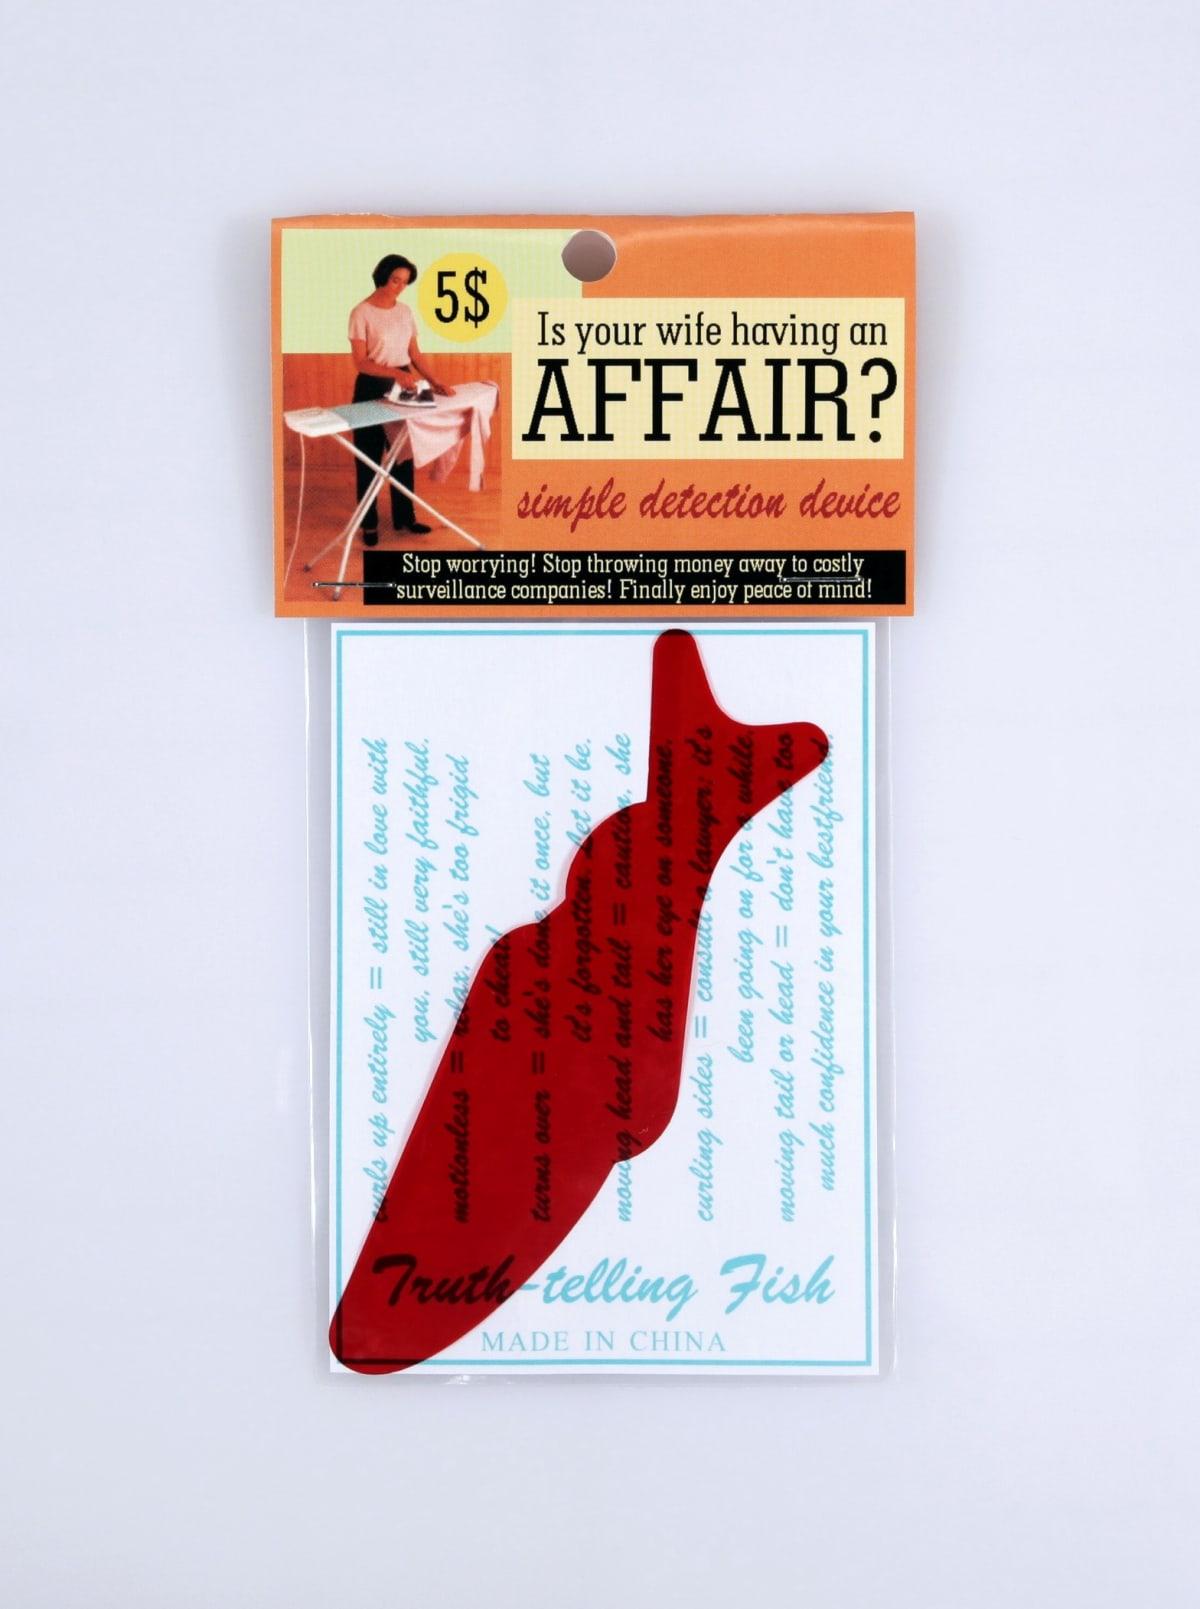 Is your wife having an affair?